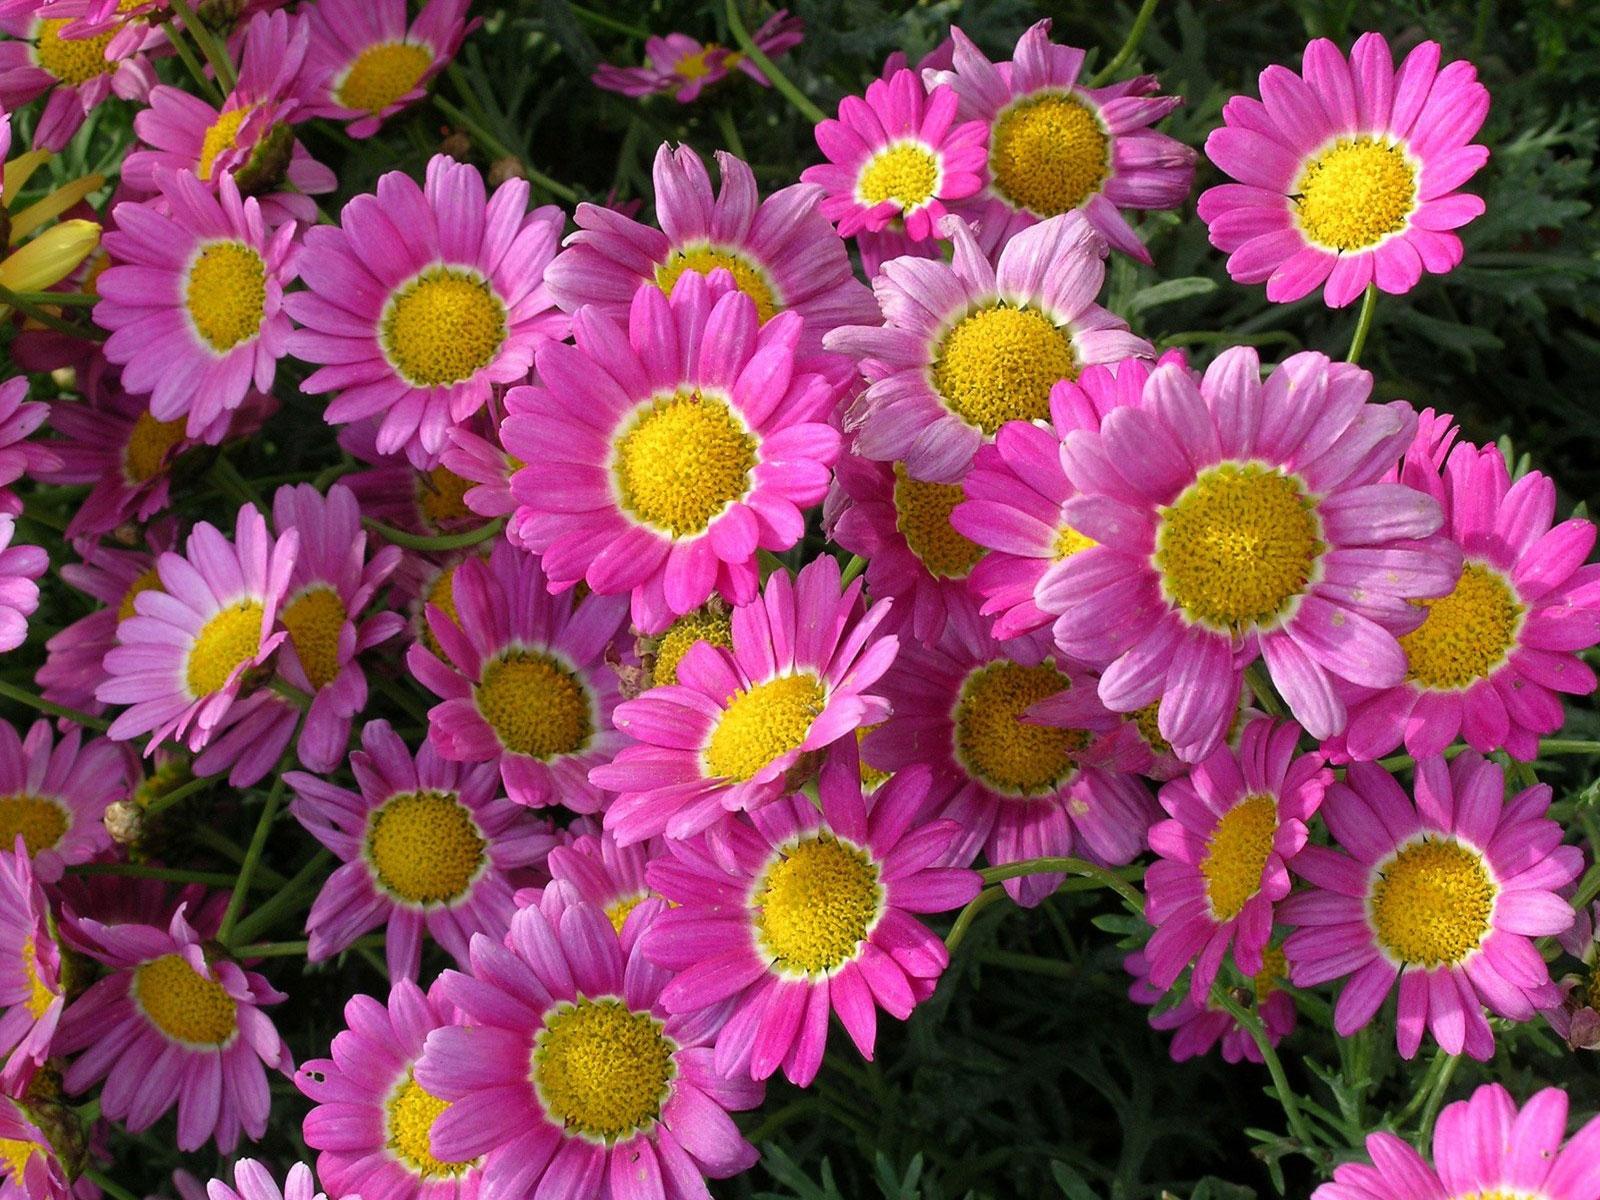 Wallpaper Flowers Green Pink Daisy Flora Petal Flowerbed